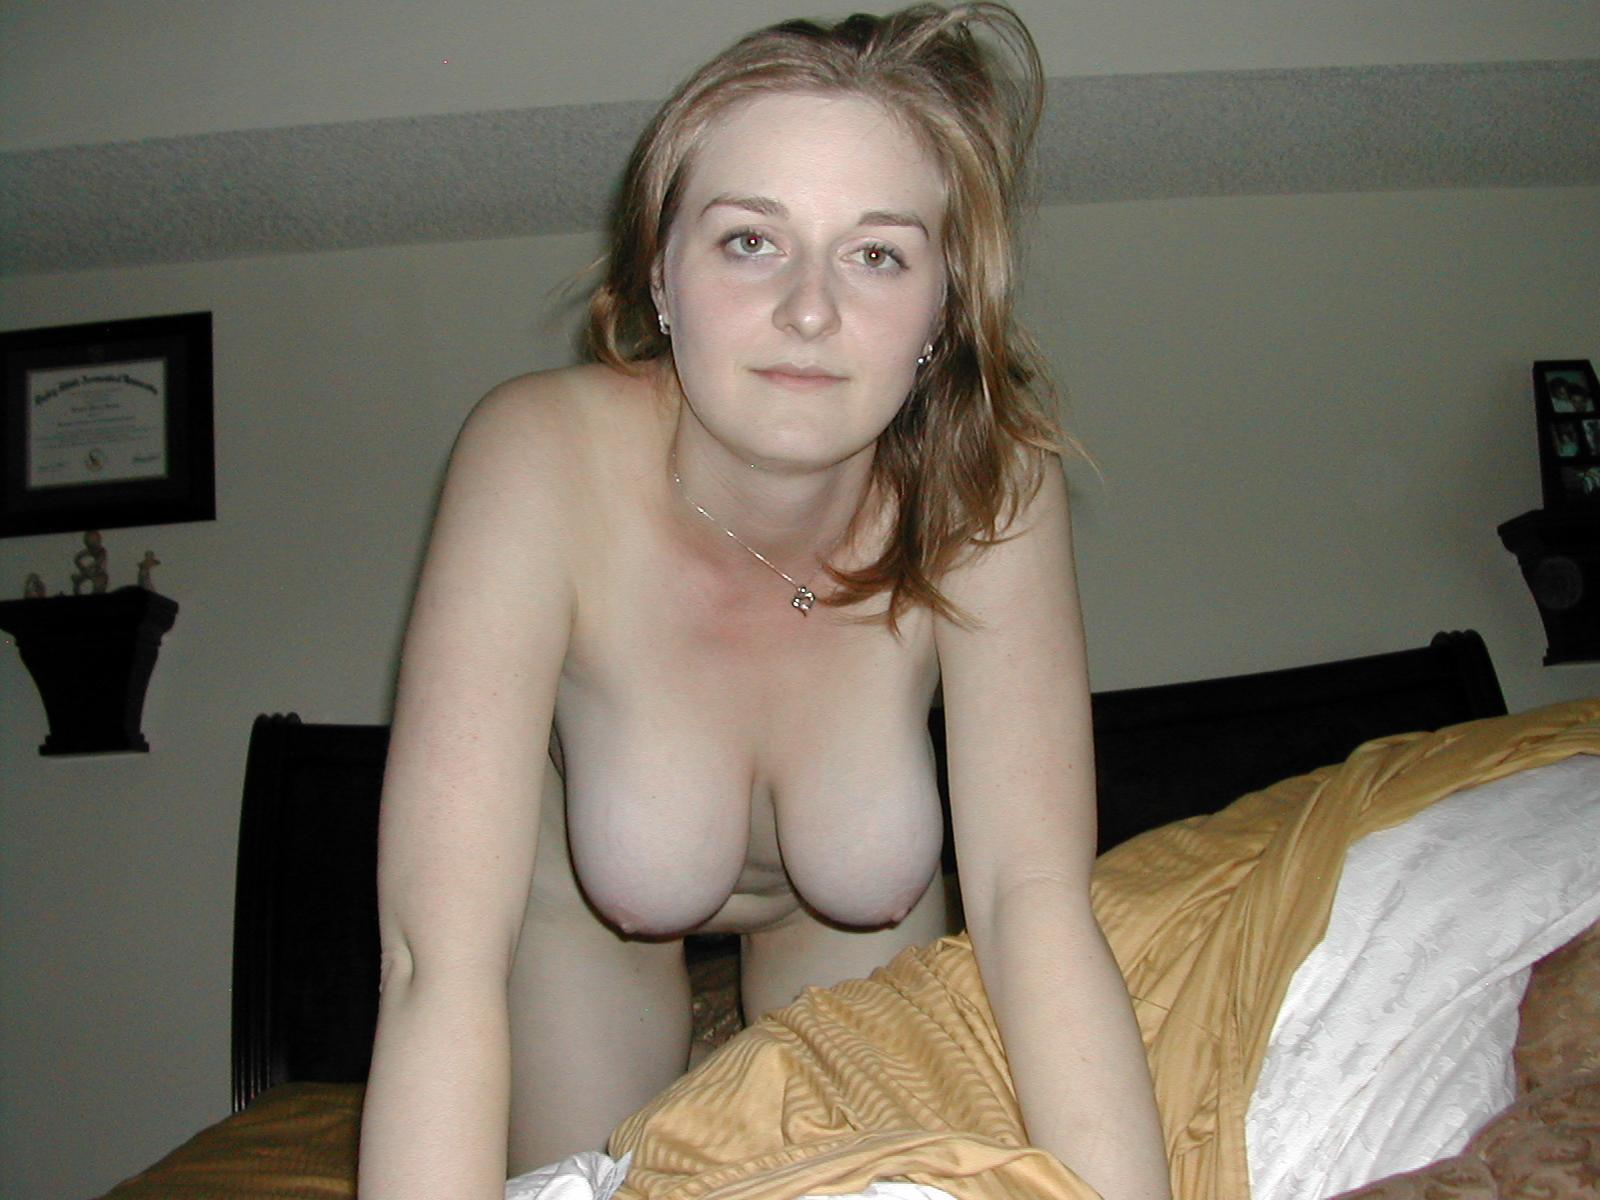 Hot girlfriend from sexxdates with cumshot 3